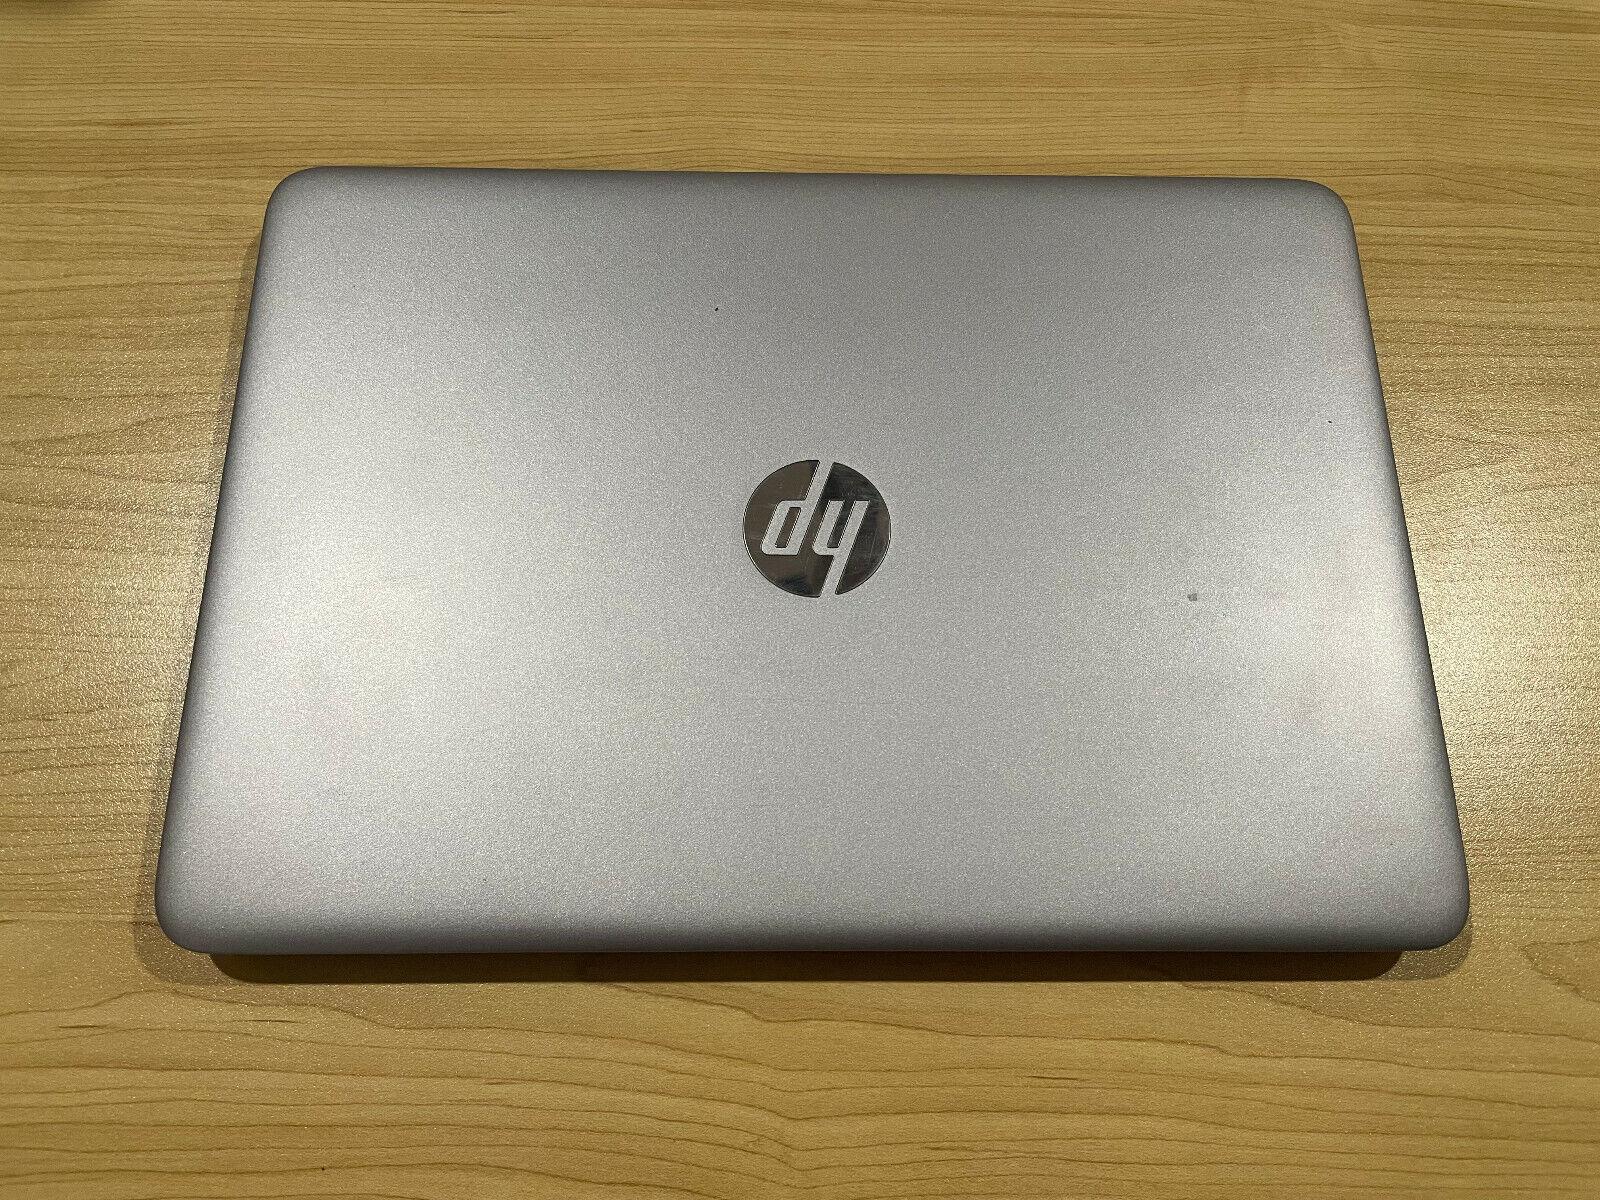 Laptop Windows - HP EliteBook 840 G3 i5 6300U 2.4GHz 8GB 240GB SSD Windows 10 Pro